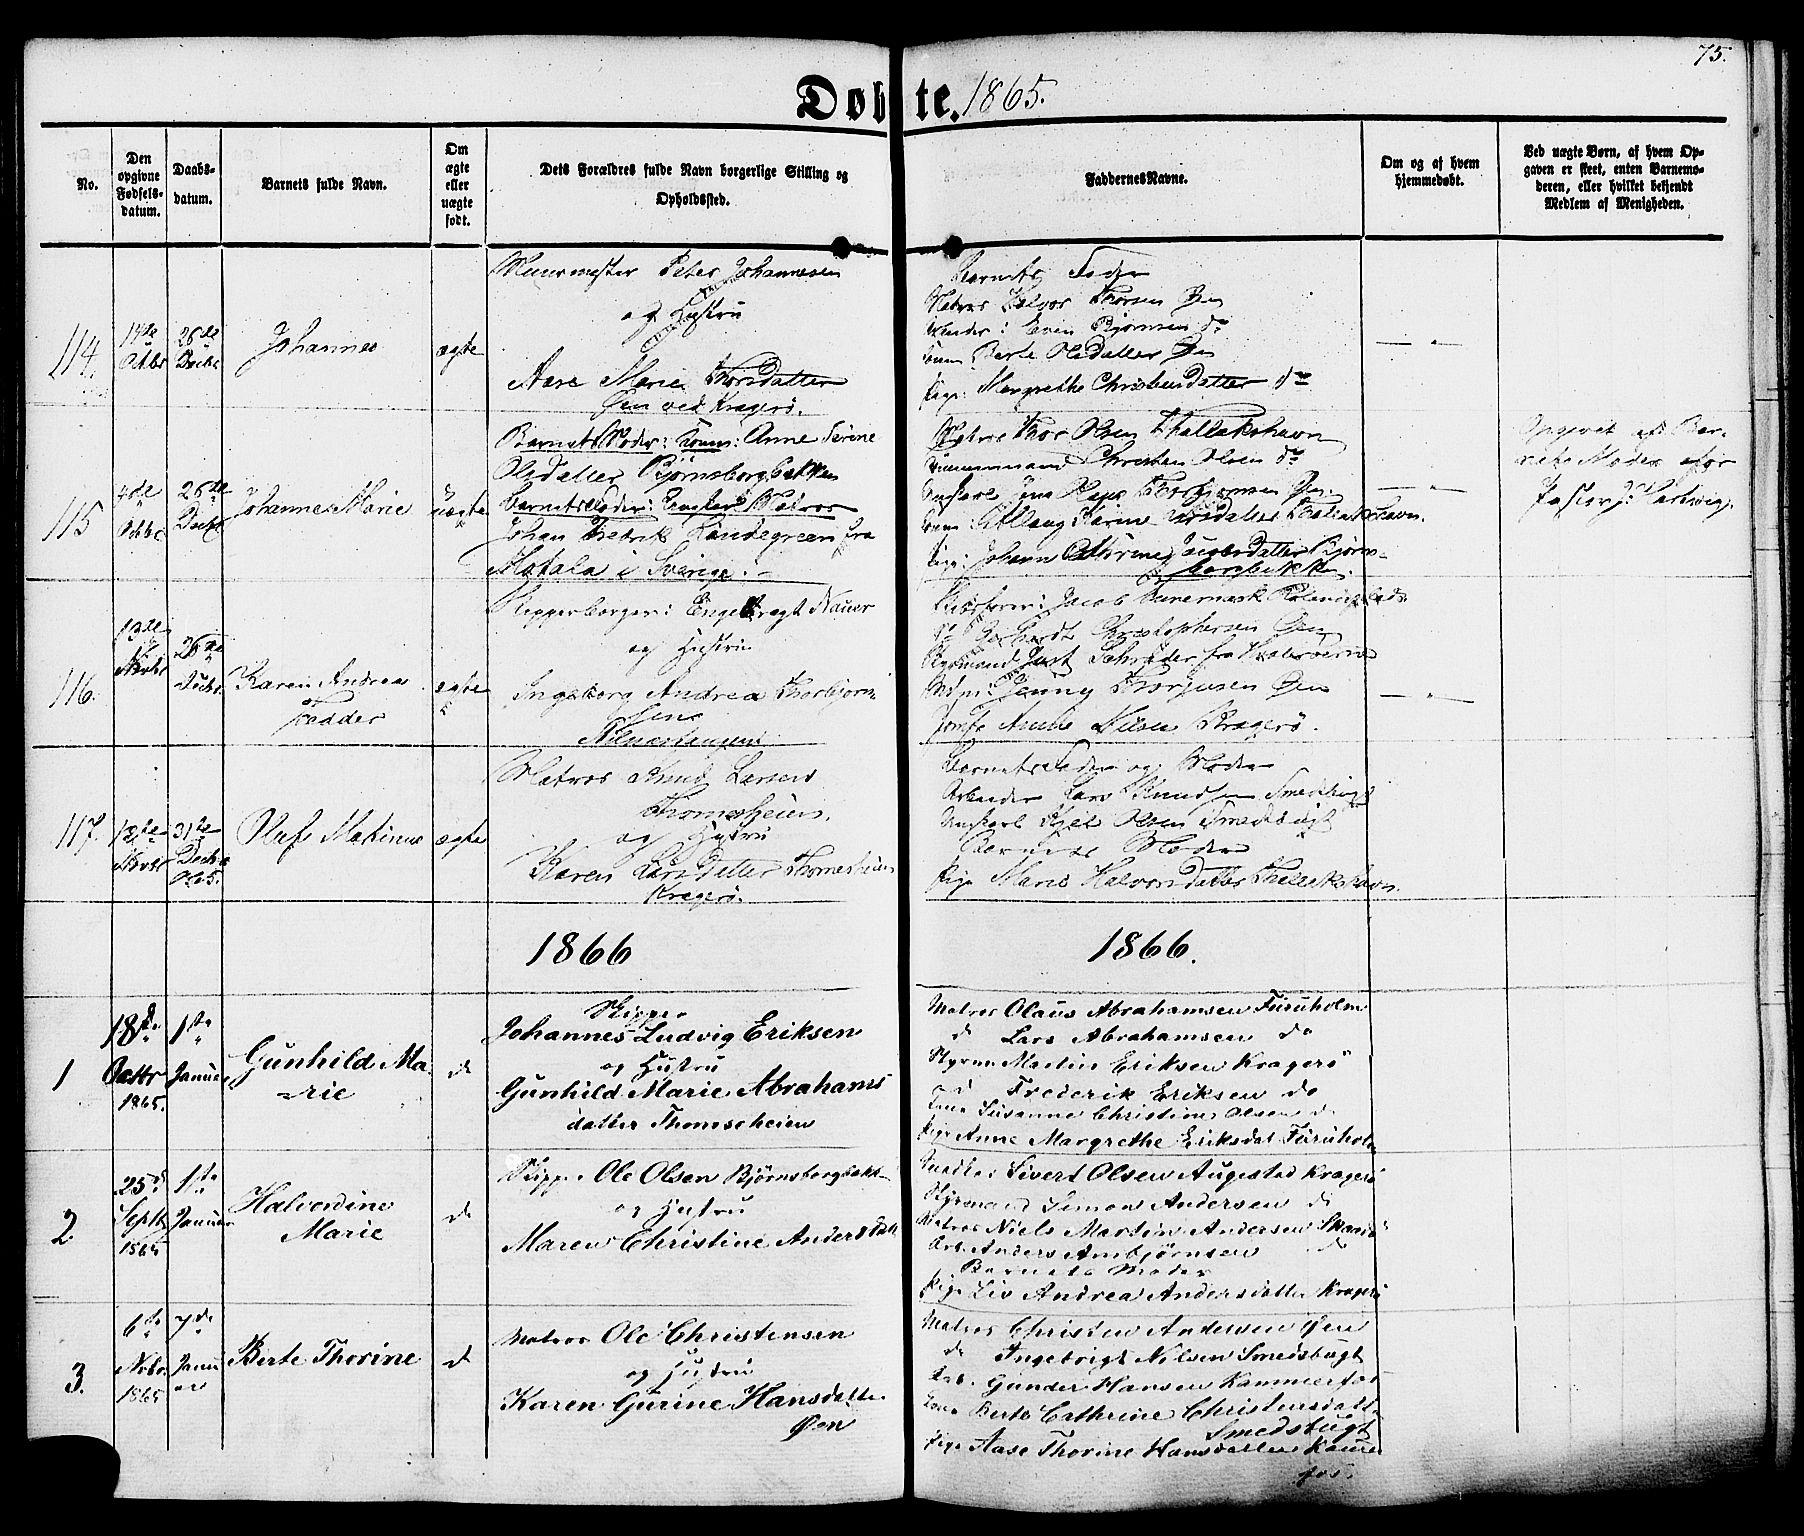 SAKO, Kragerø kirkebøker, F/Fa/L0007: Ministerialbok nr. 7, 1861-1875, s. 75